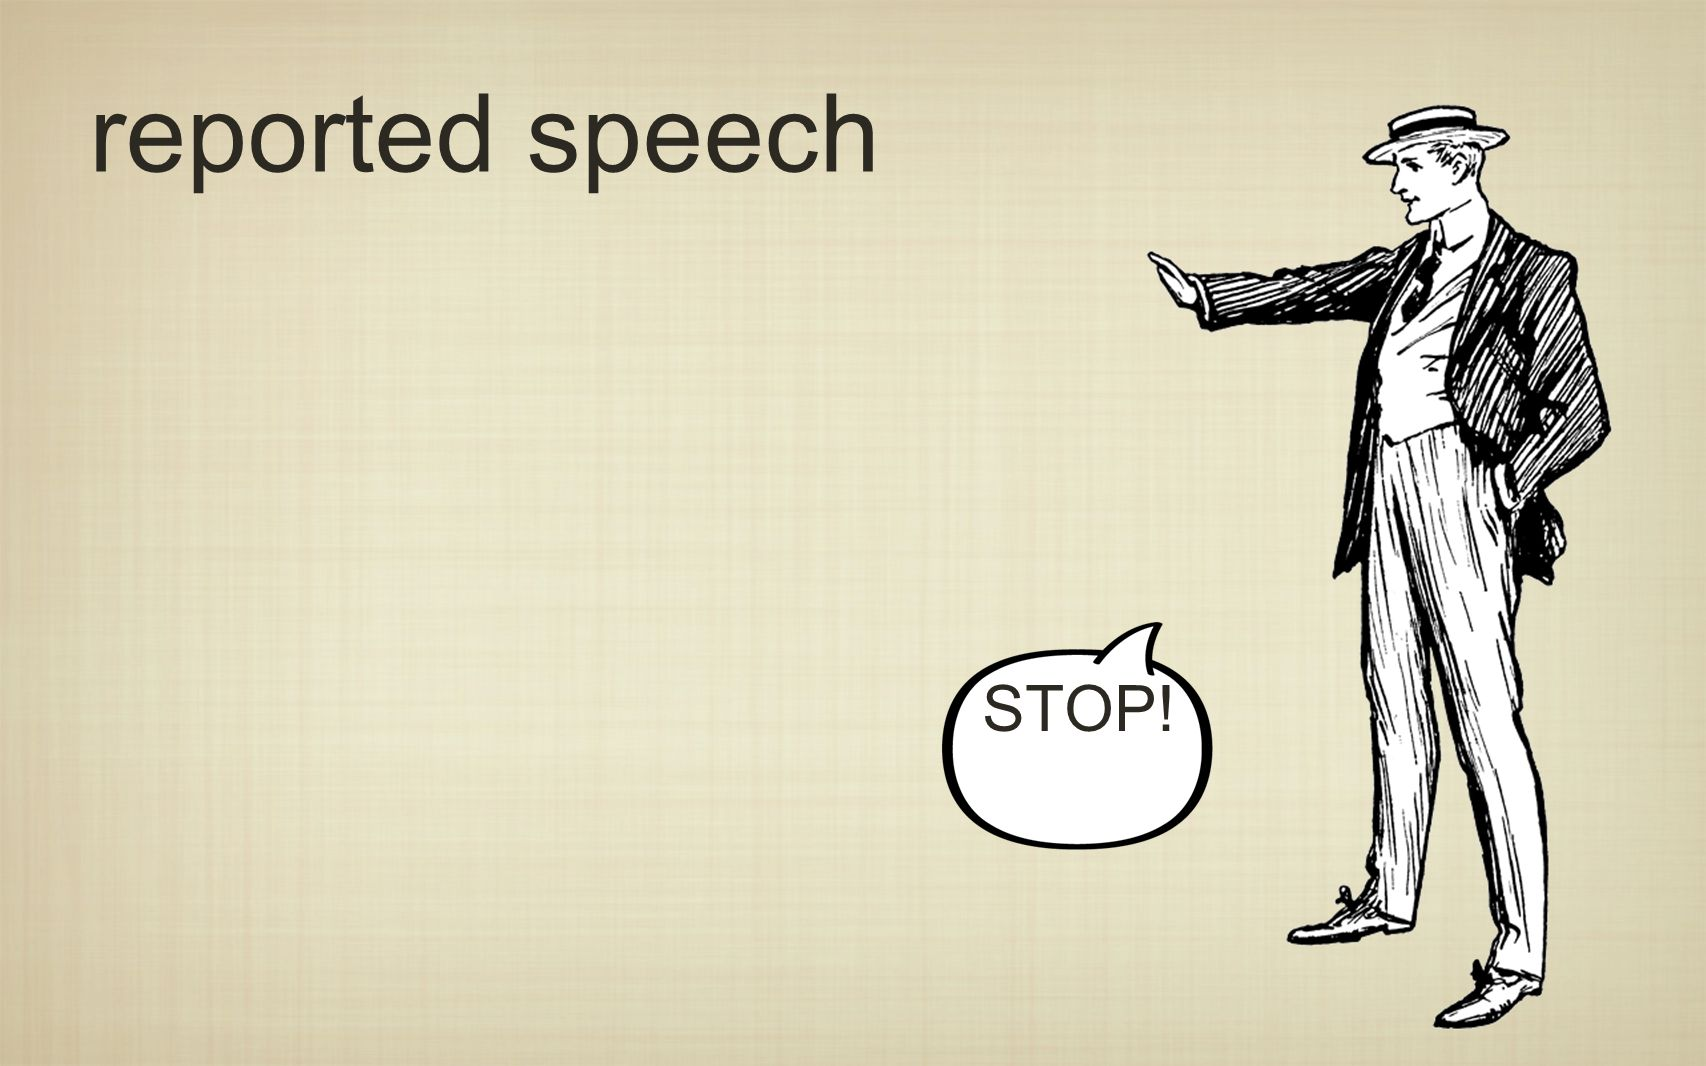 reported speech STOP!